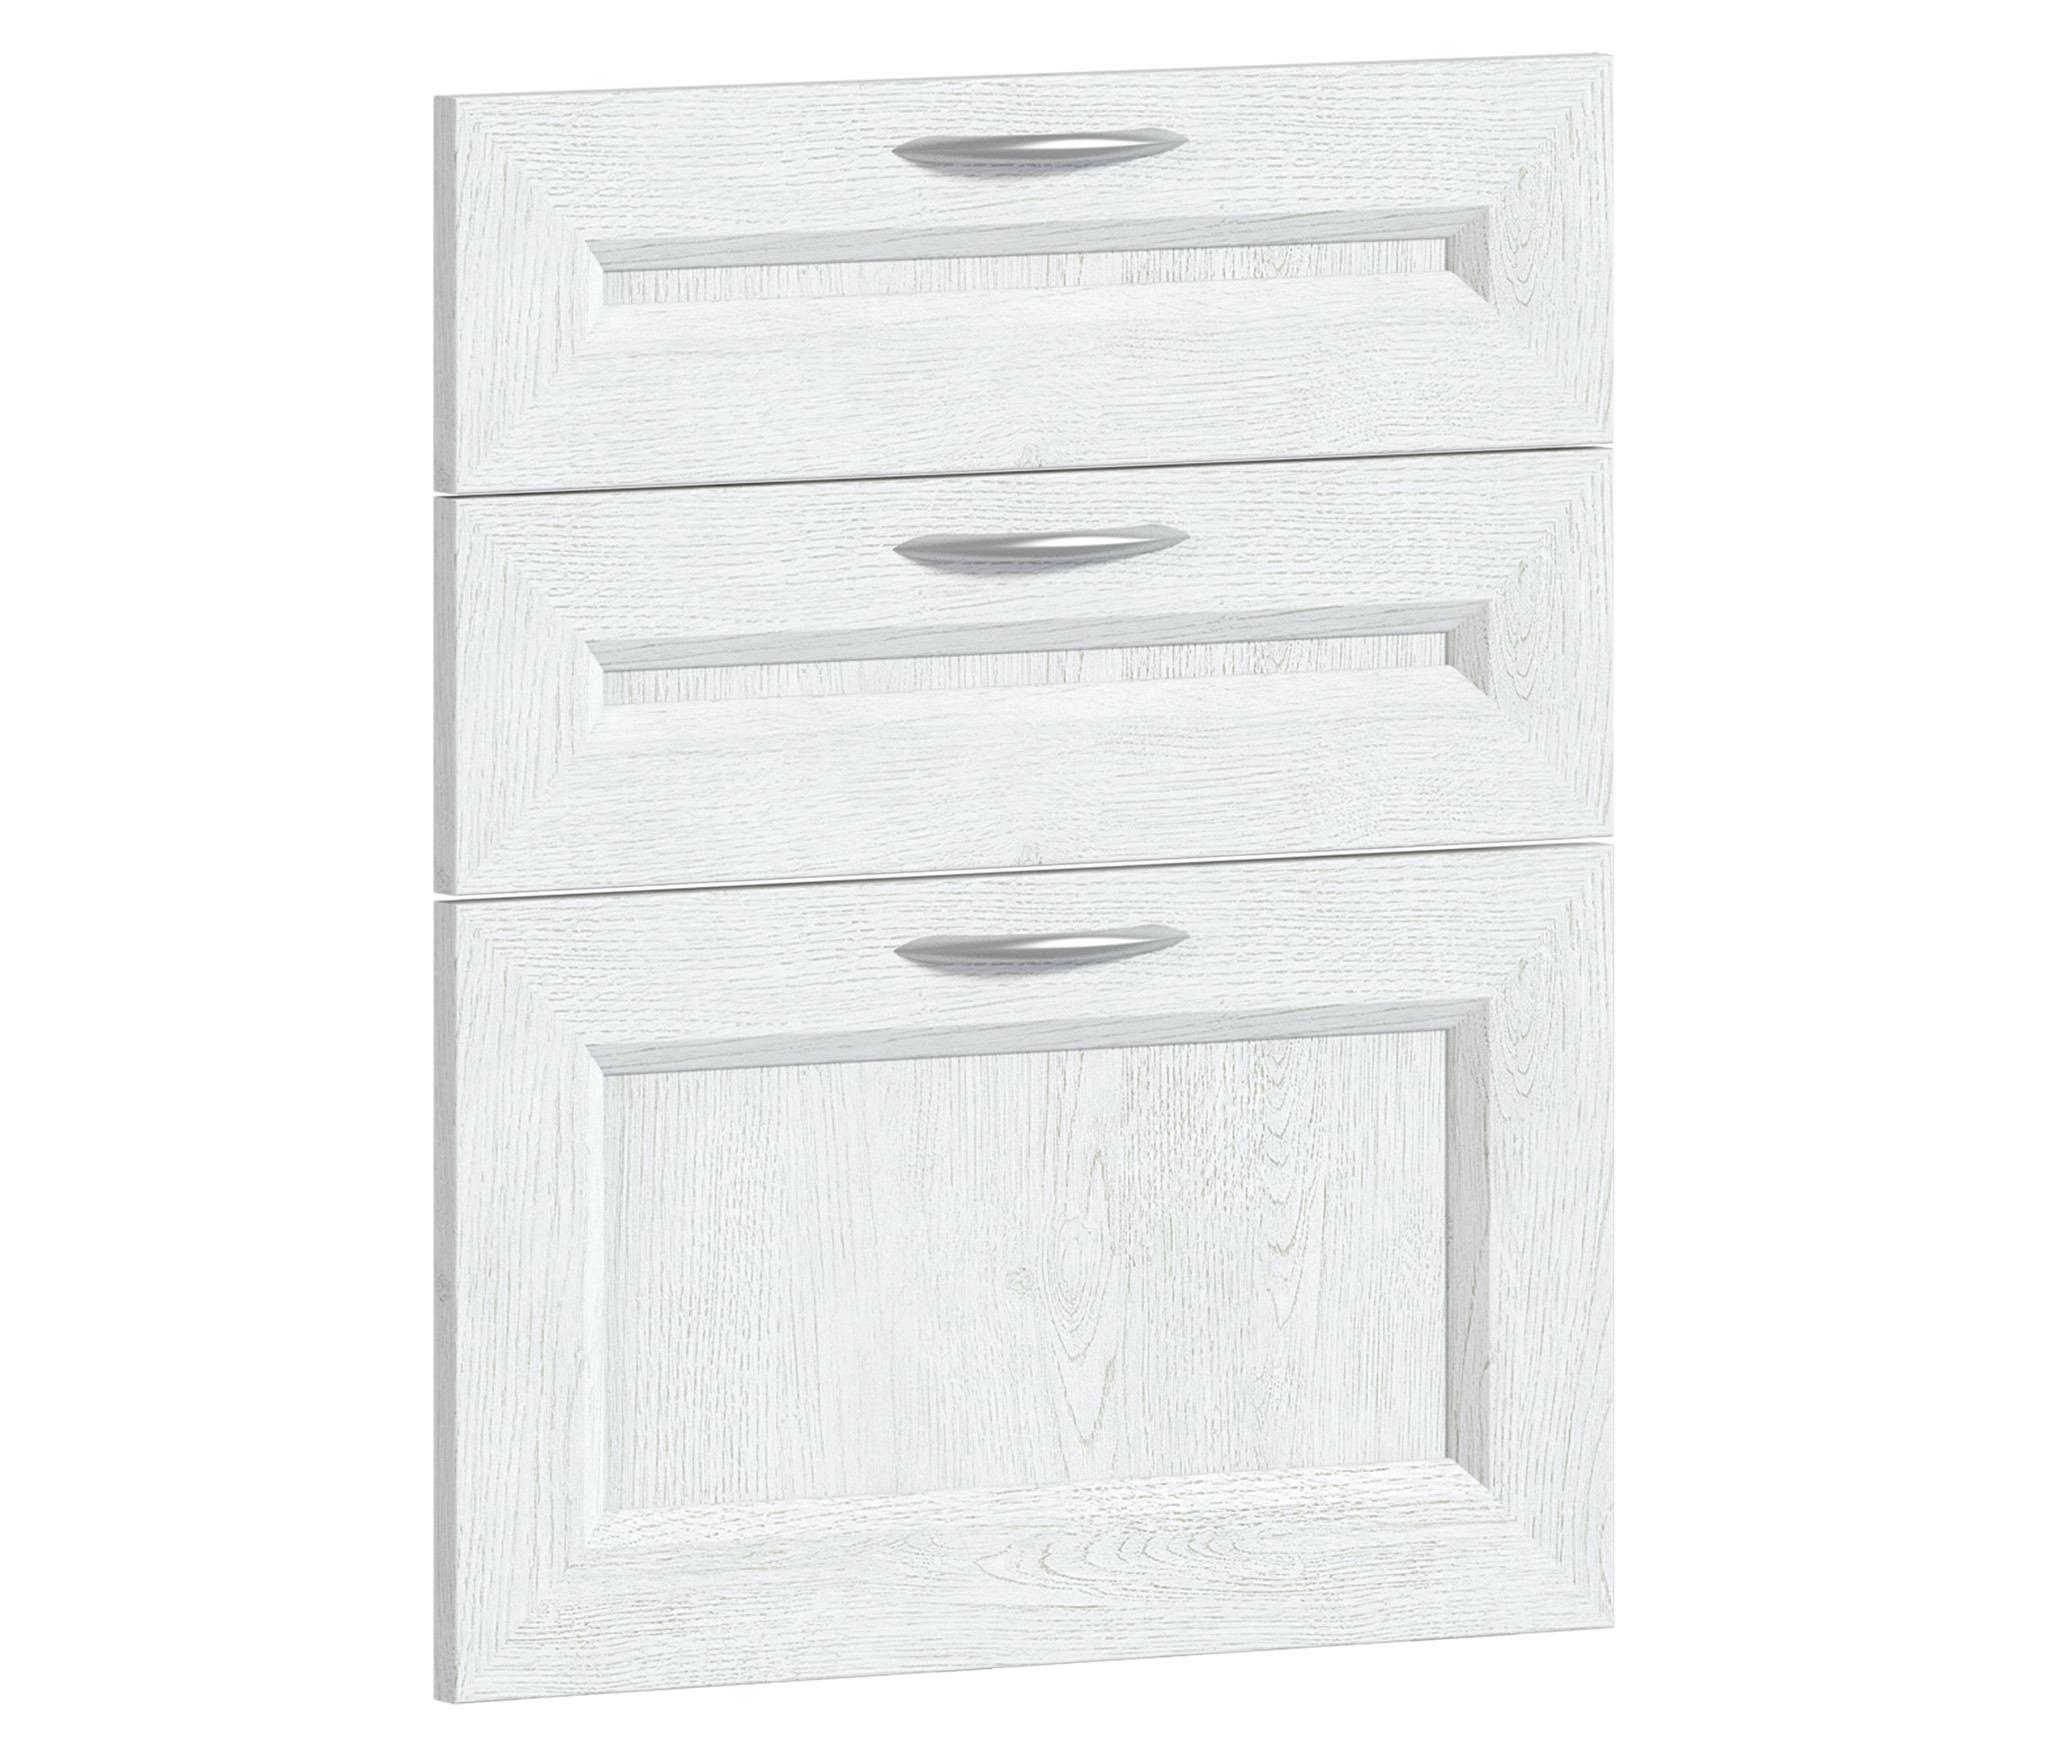 Фасад Регина Н-360Мебель для кухни<br><br><br>Длина мм: 596<br>Высота мм: 713<br>Глубина мм: 19